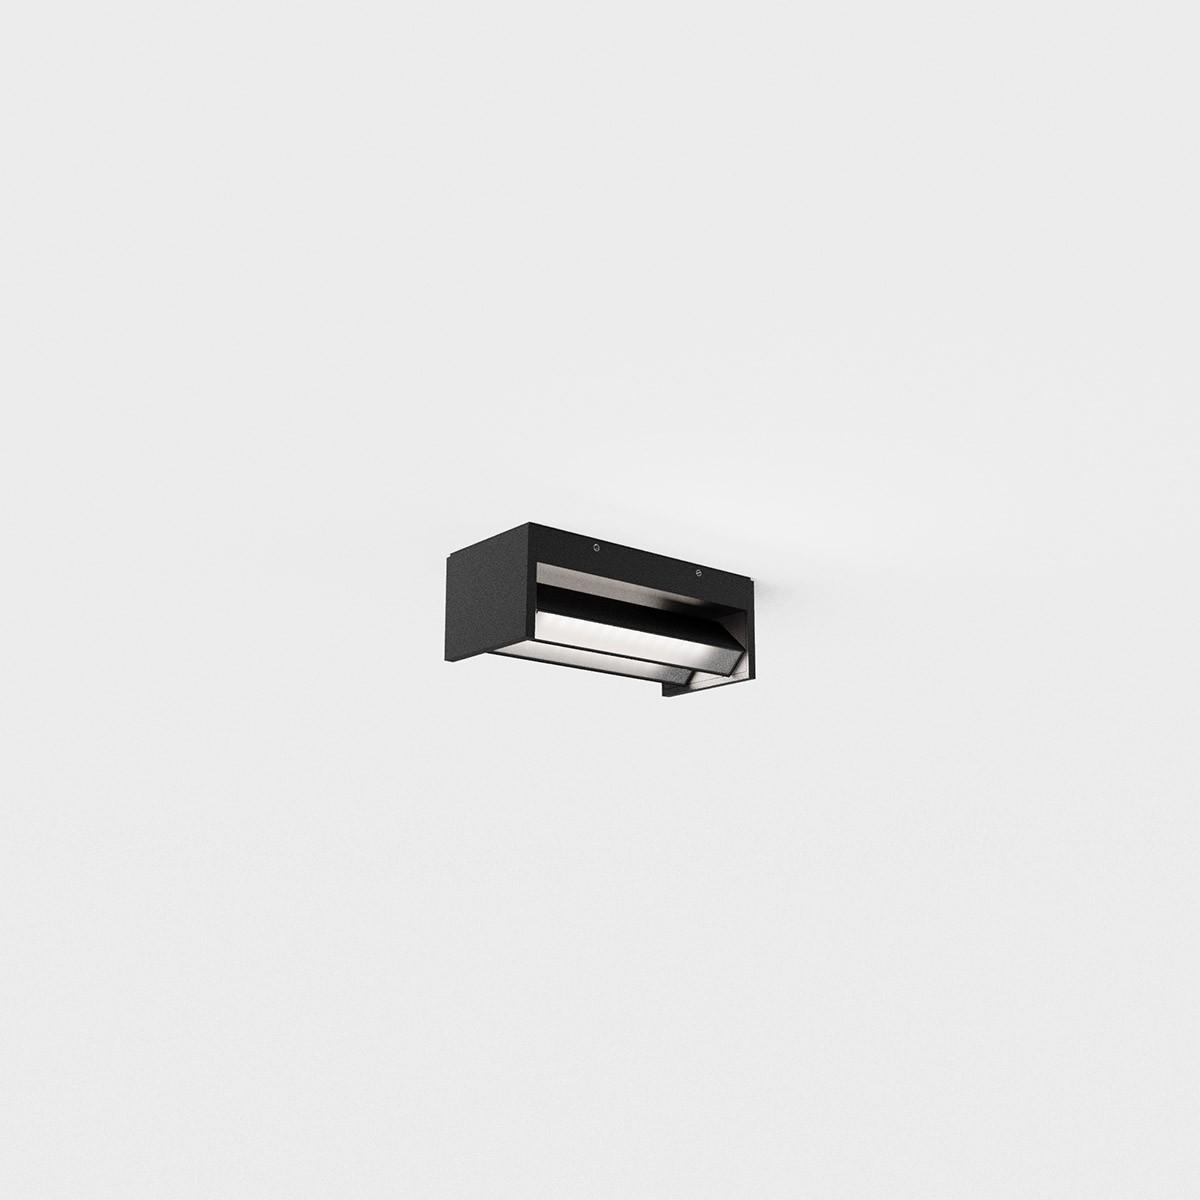 slat wand deckenleuchte deep black schwarz bauprofi aurich. Black Bedroom Furniture Sets. Home Design Ideas